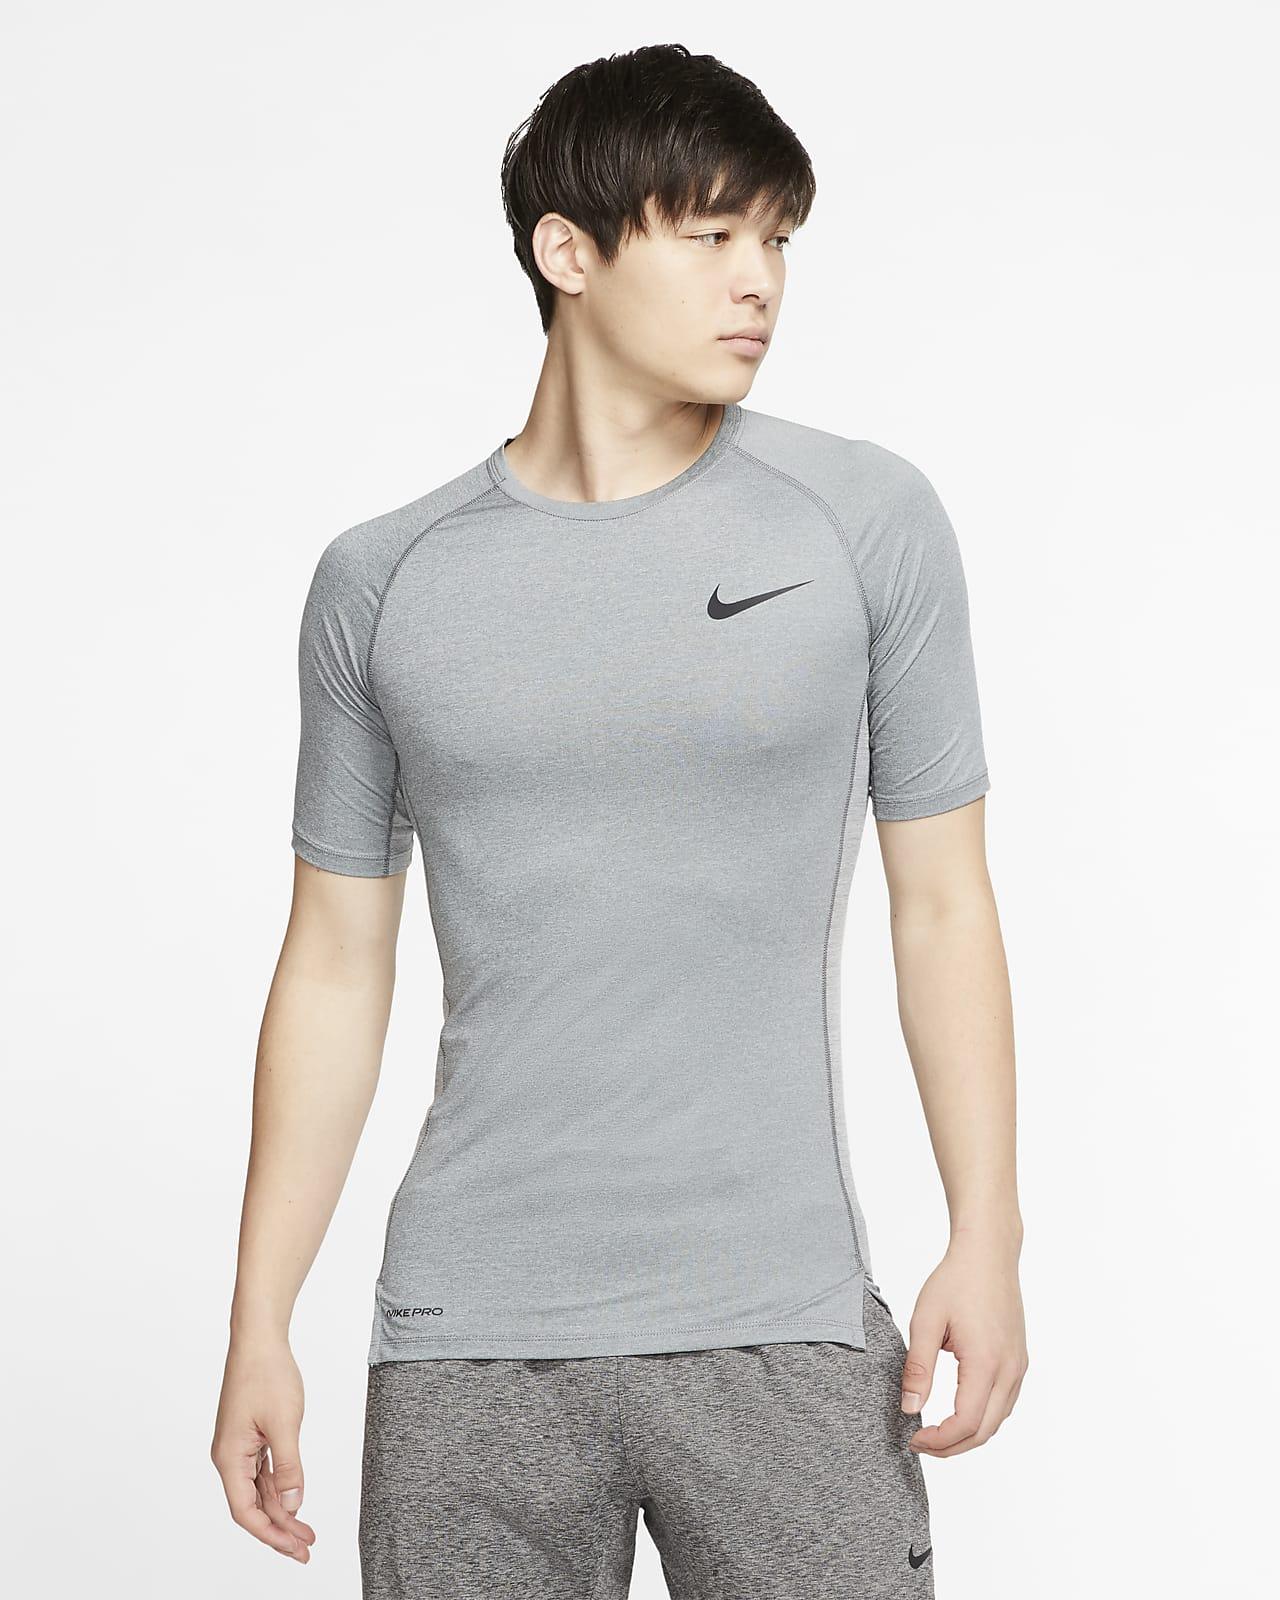 Nike Pro Camiseta de manga corta y ajuste ceñido - Hombre